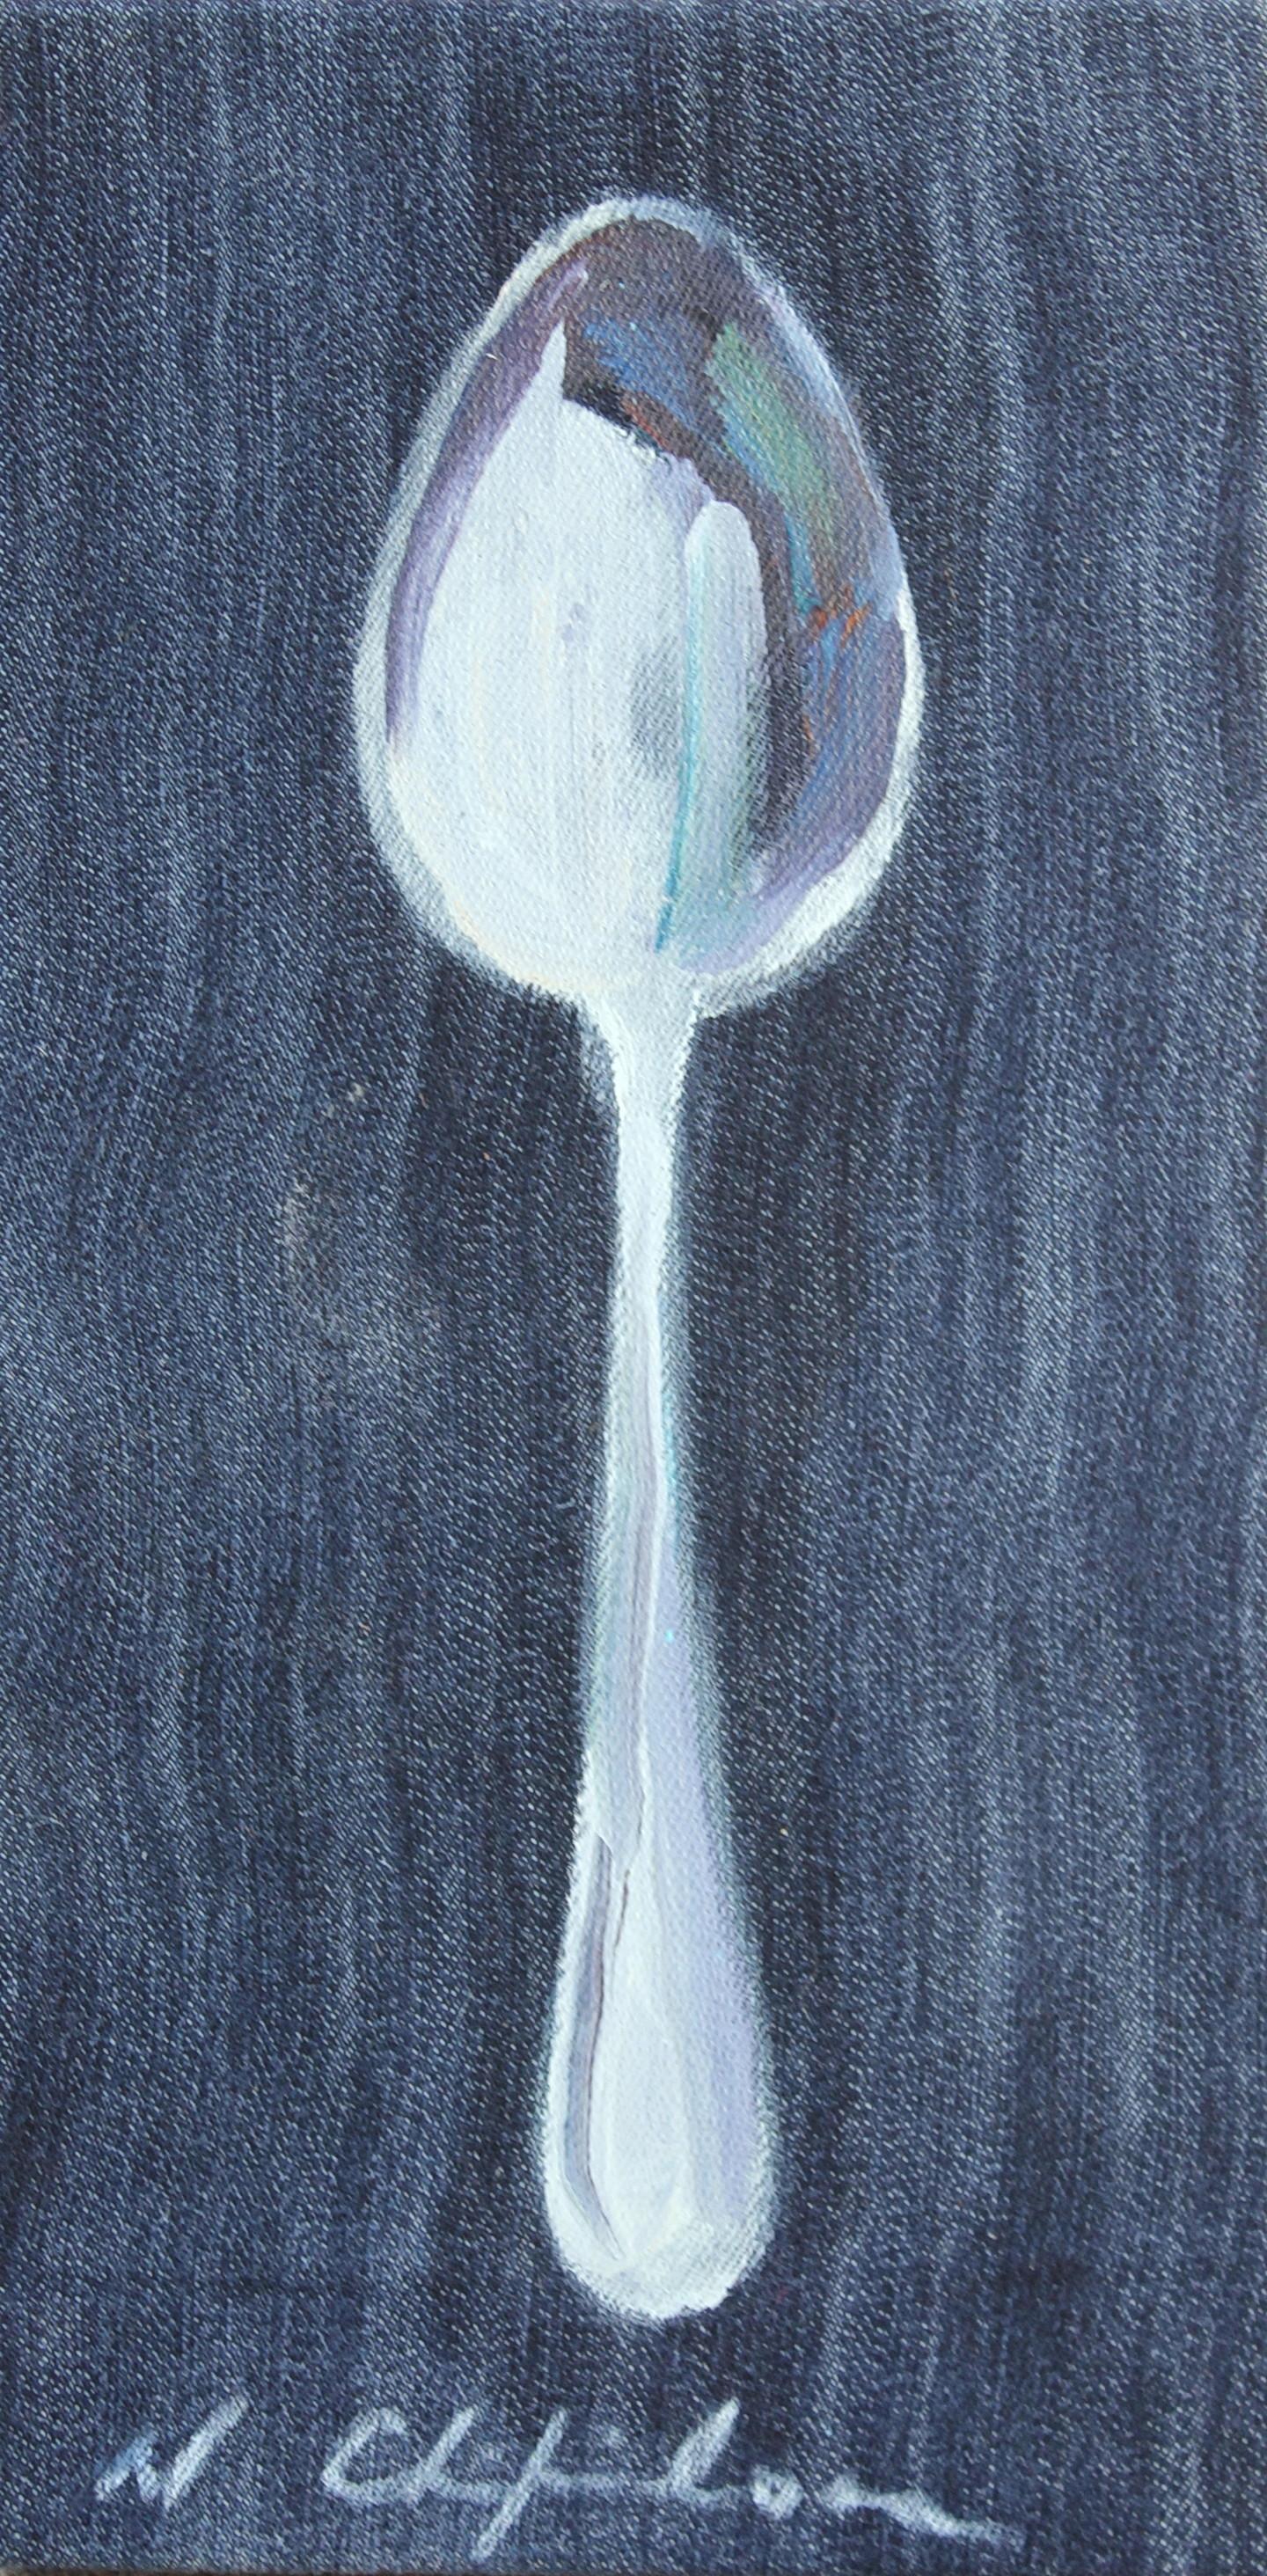 Nath Chipilova (Atelier NN art store) - Jeans Spoon 2